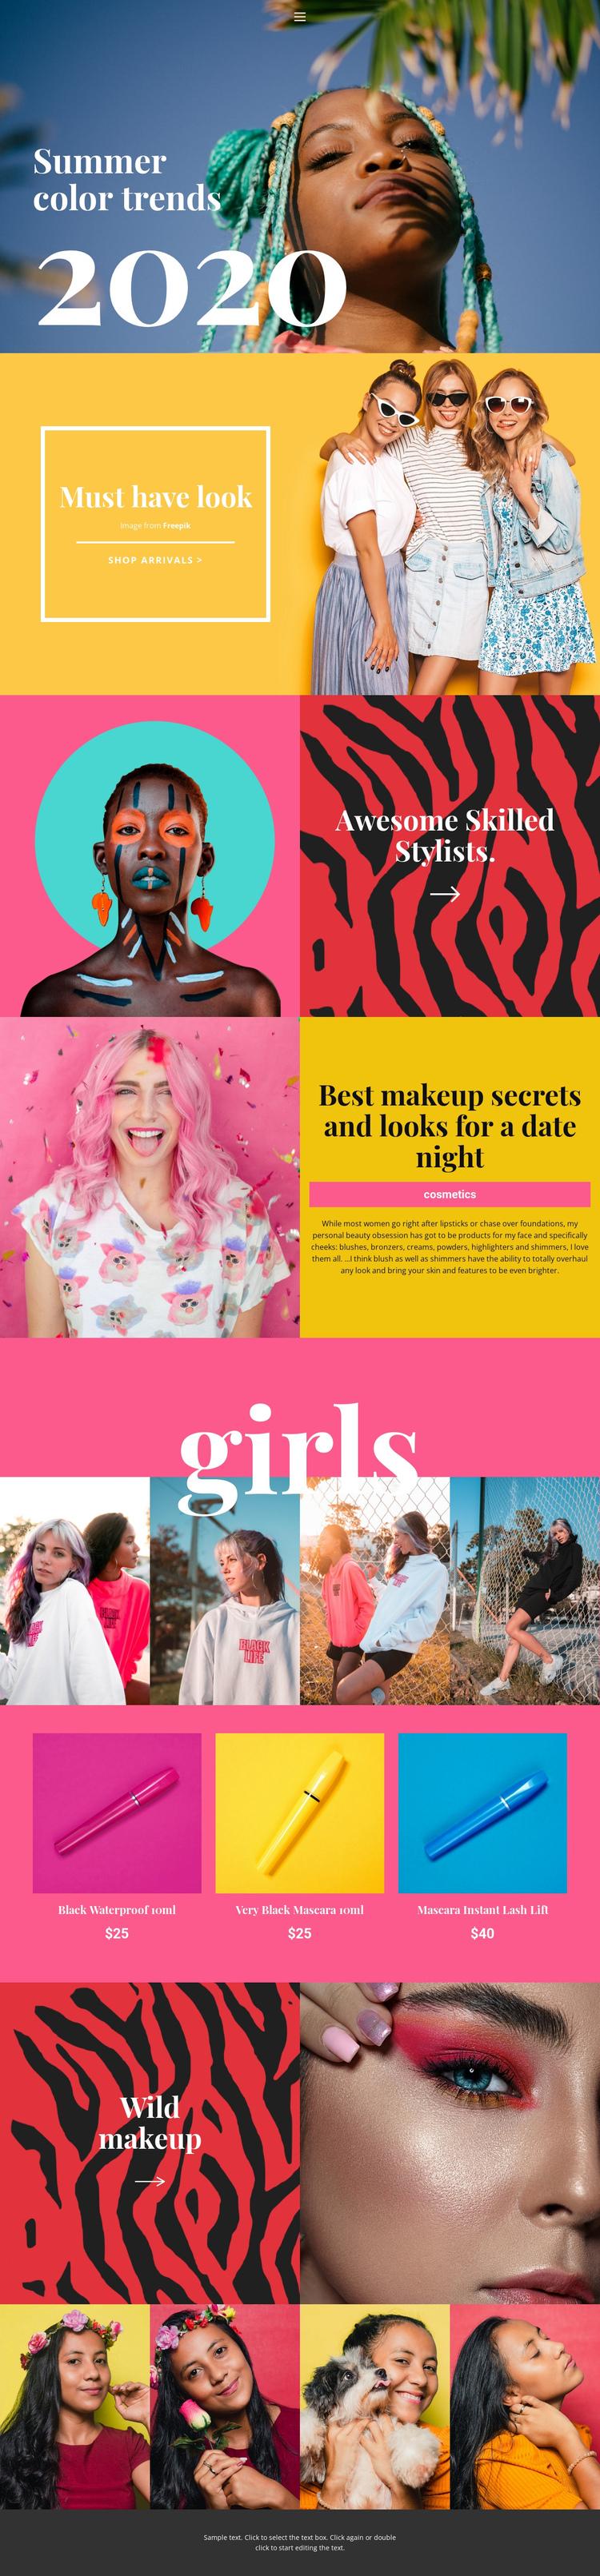 Beauty trends info Website Builder Software